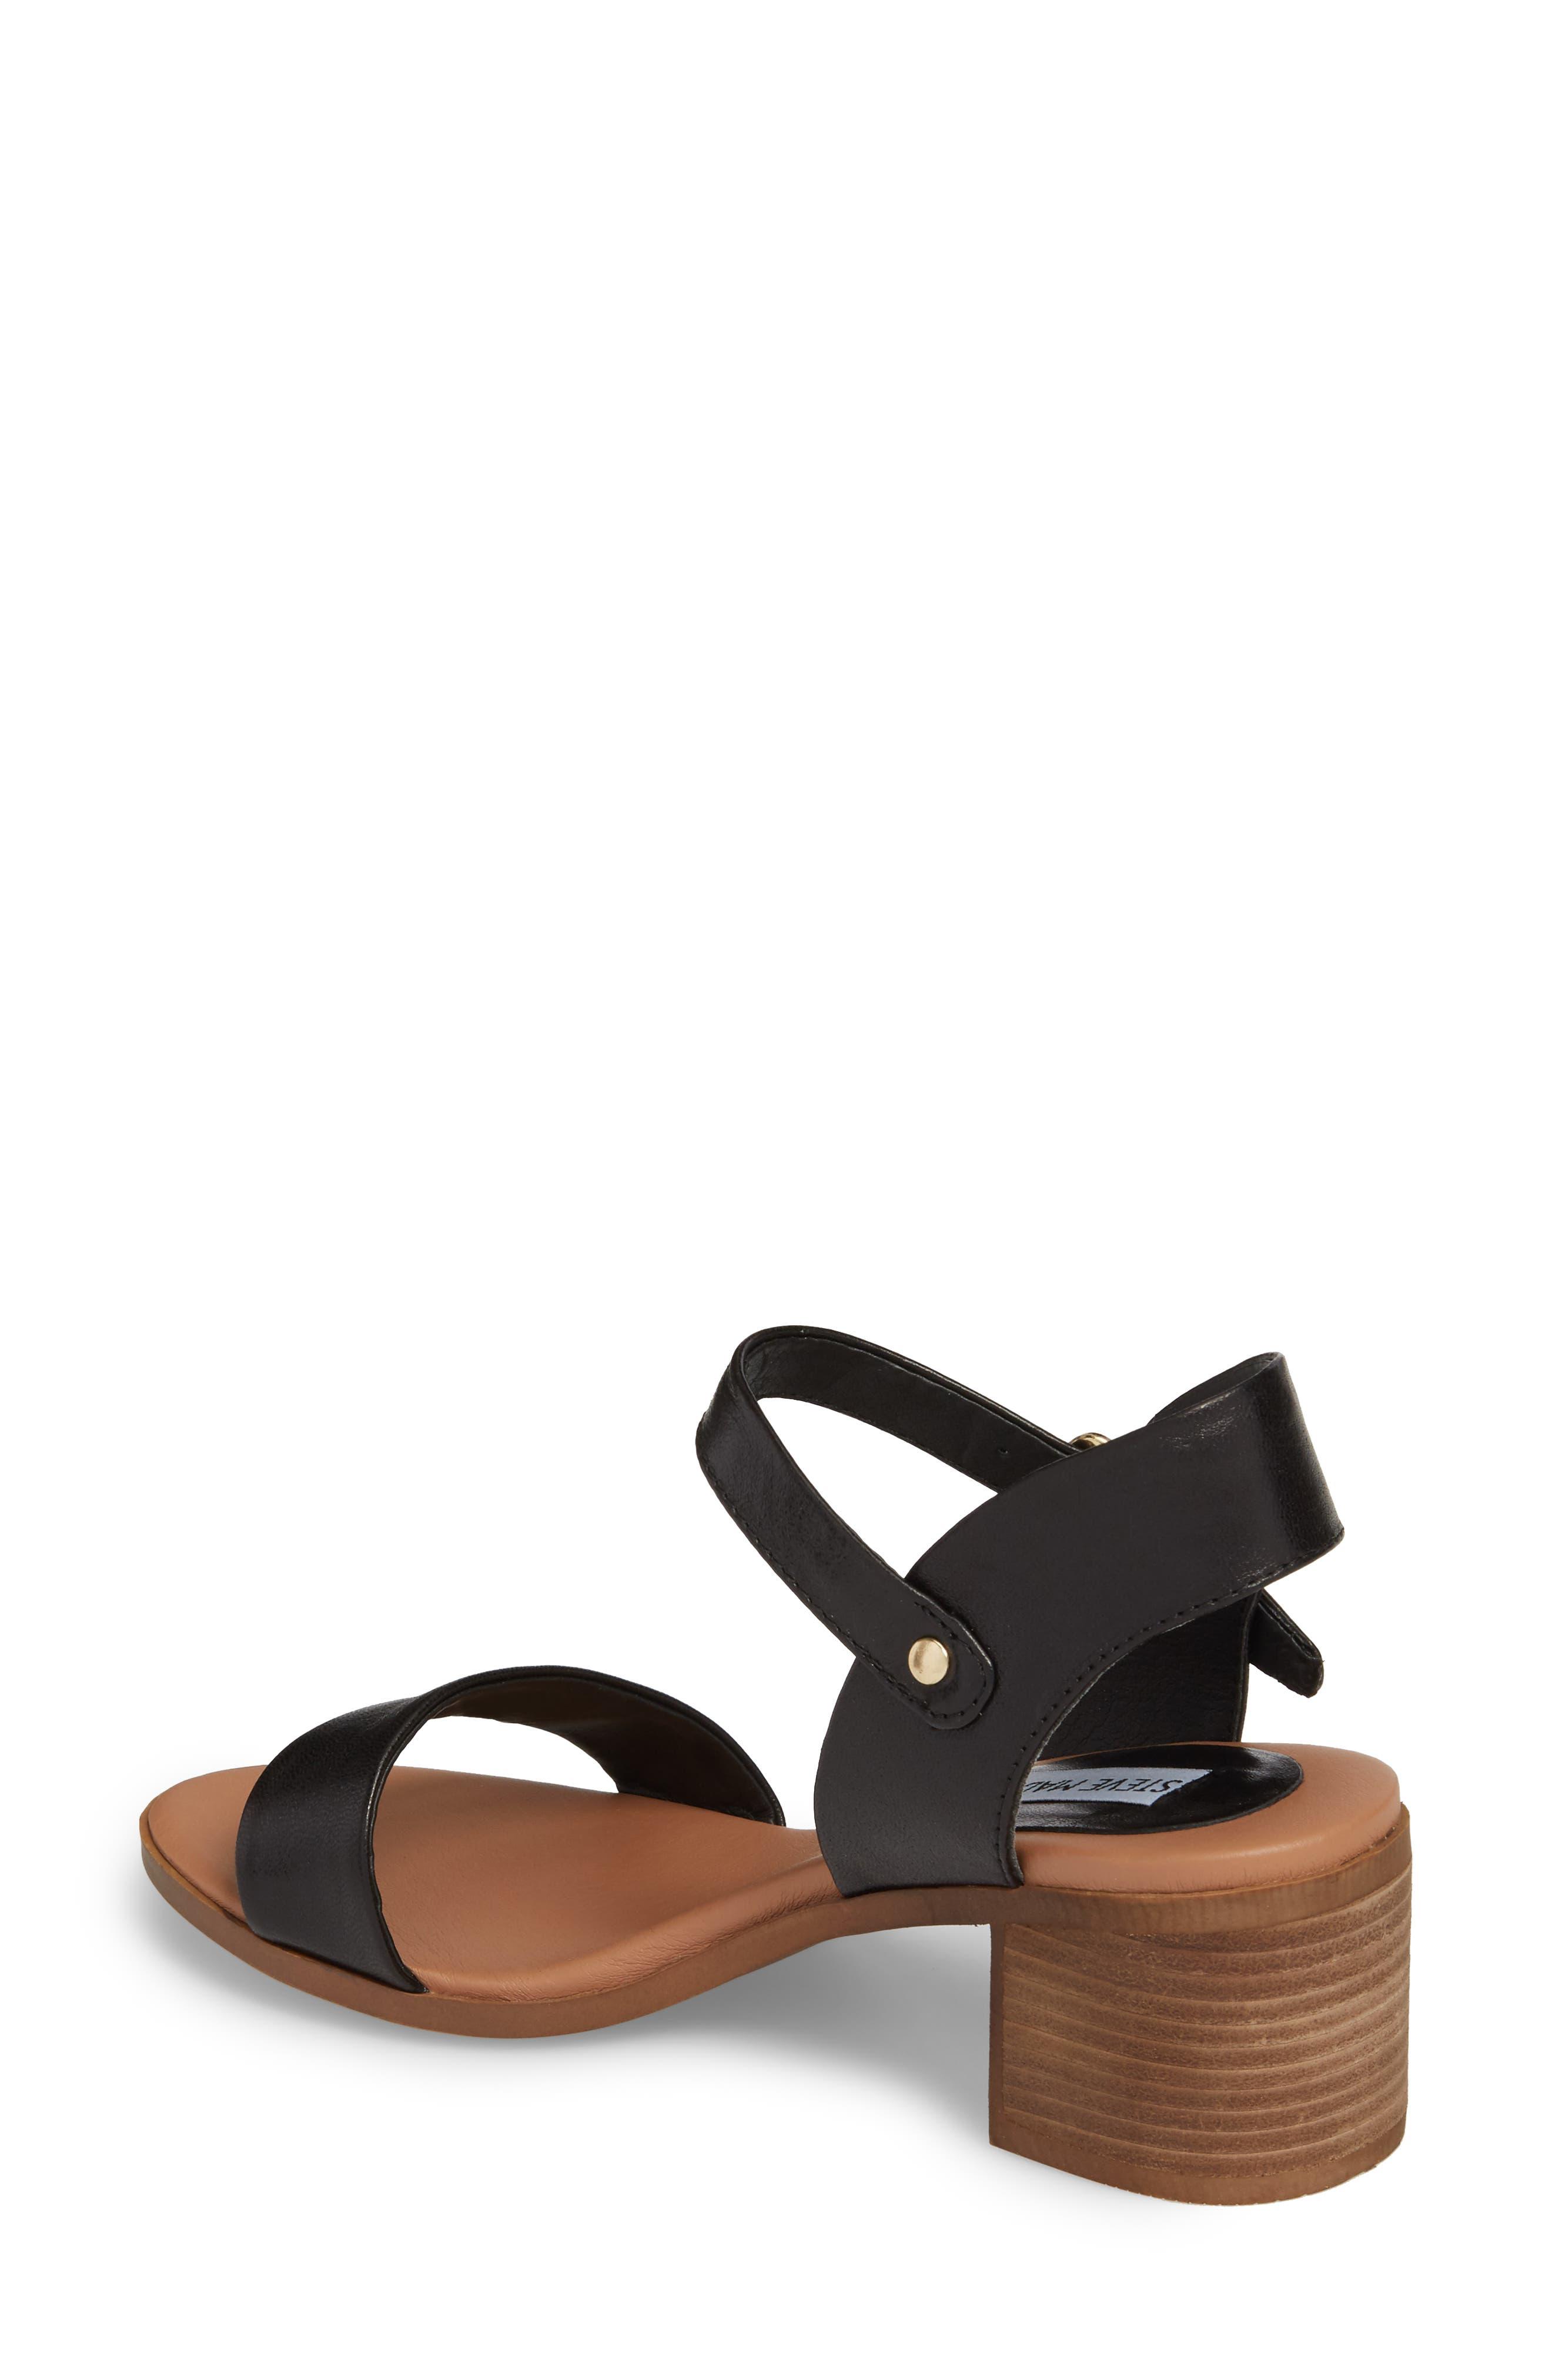 April Block Heel Sandal,                             Alternate thumbnail 2, color,                             BLACK LEATHER